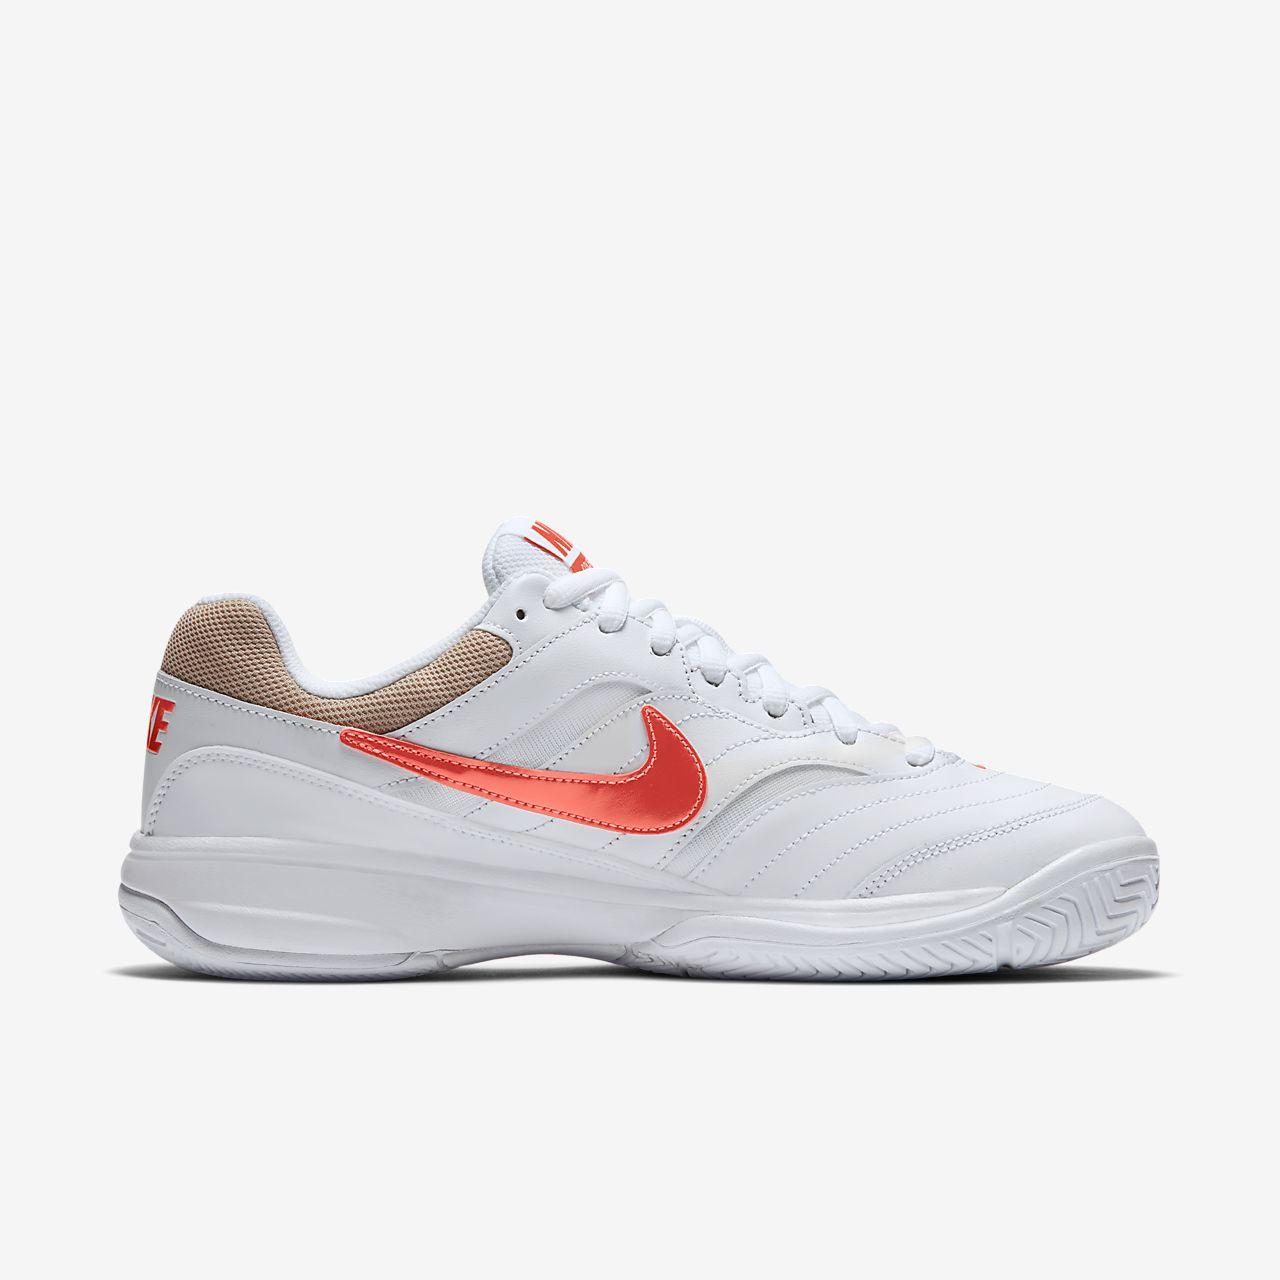 a0b7cea942c16 NikeCourt Lite Men s Hard Court Tennis Shoe. Nike.com GB